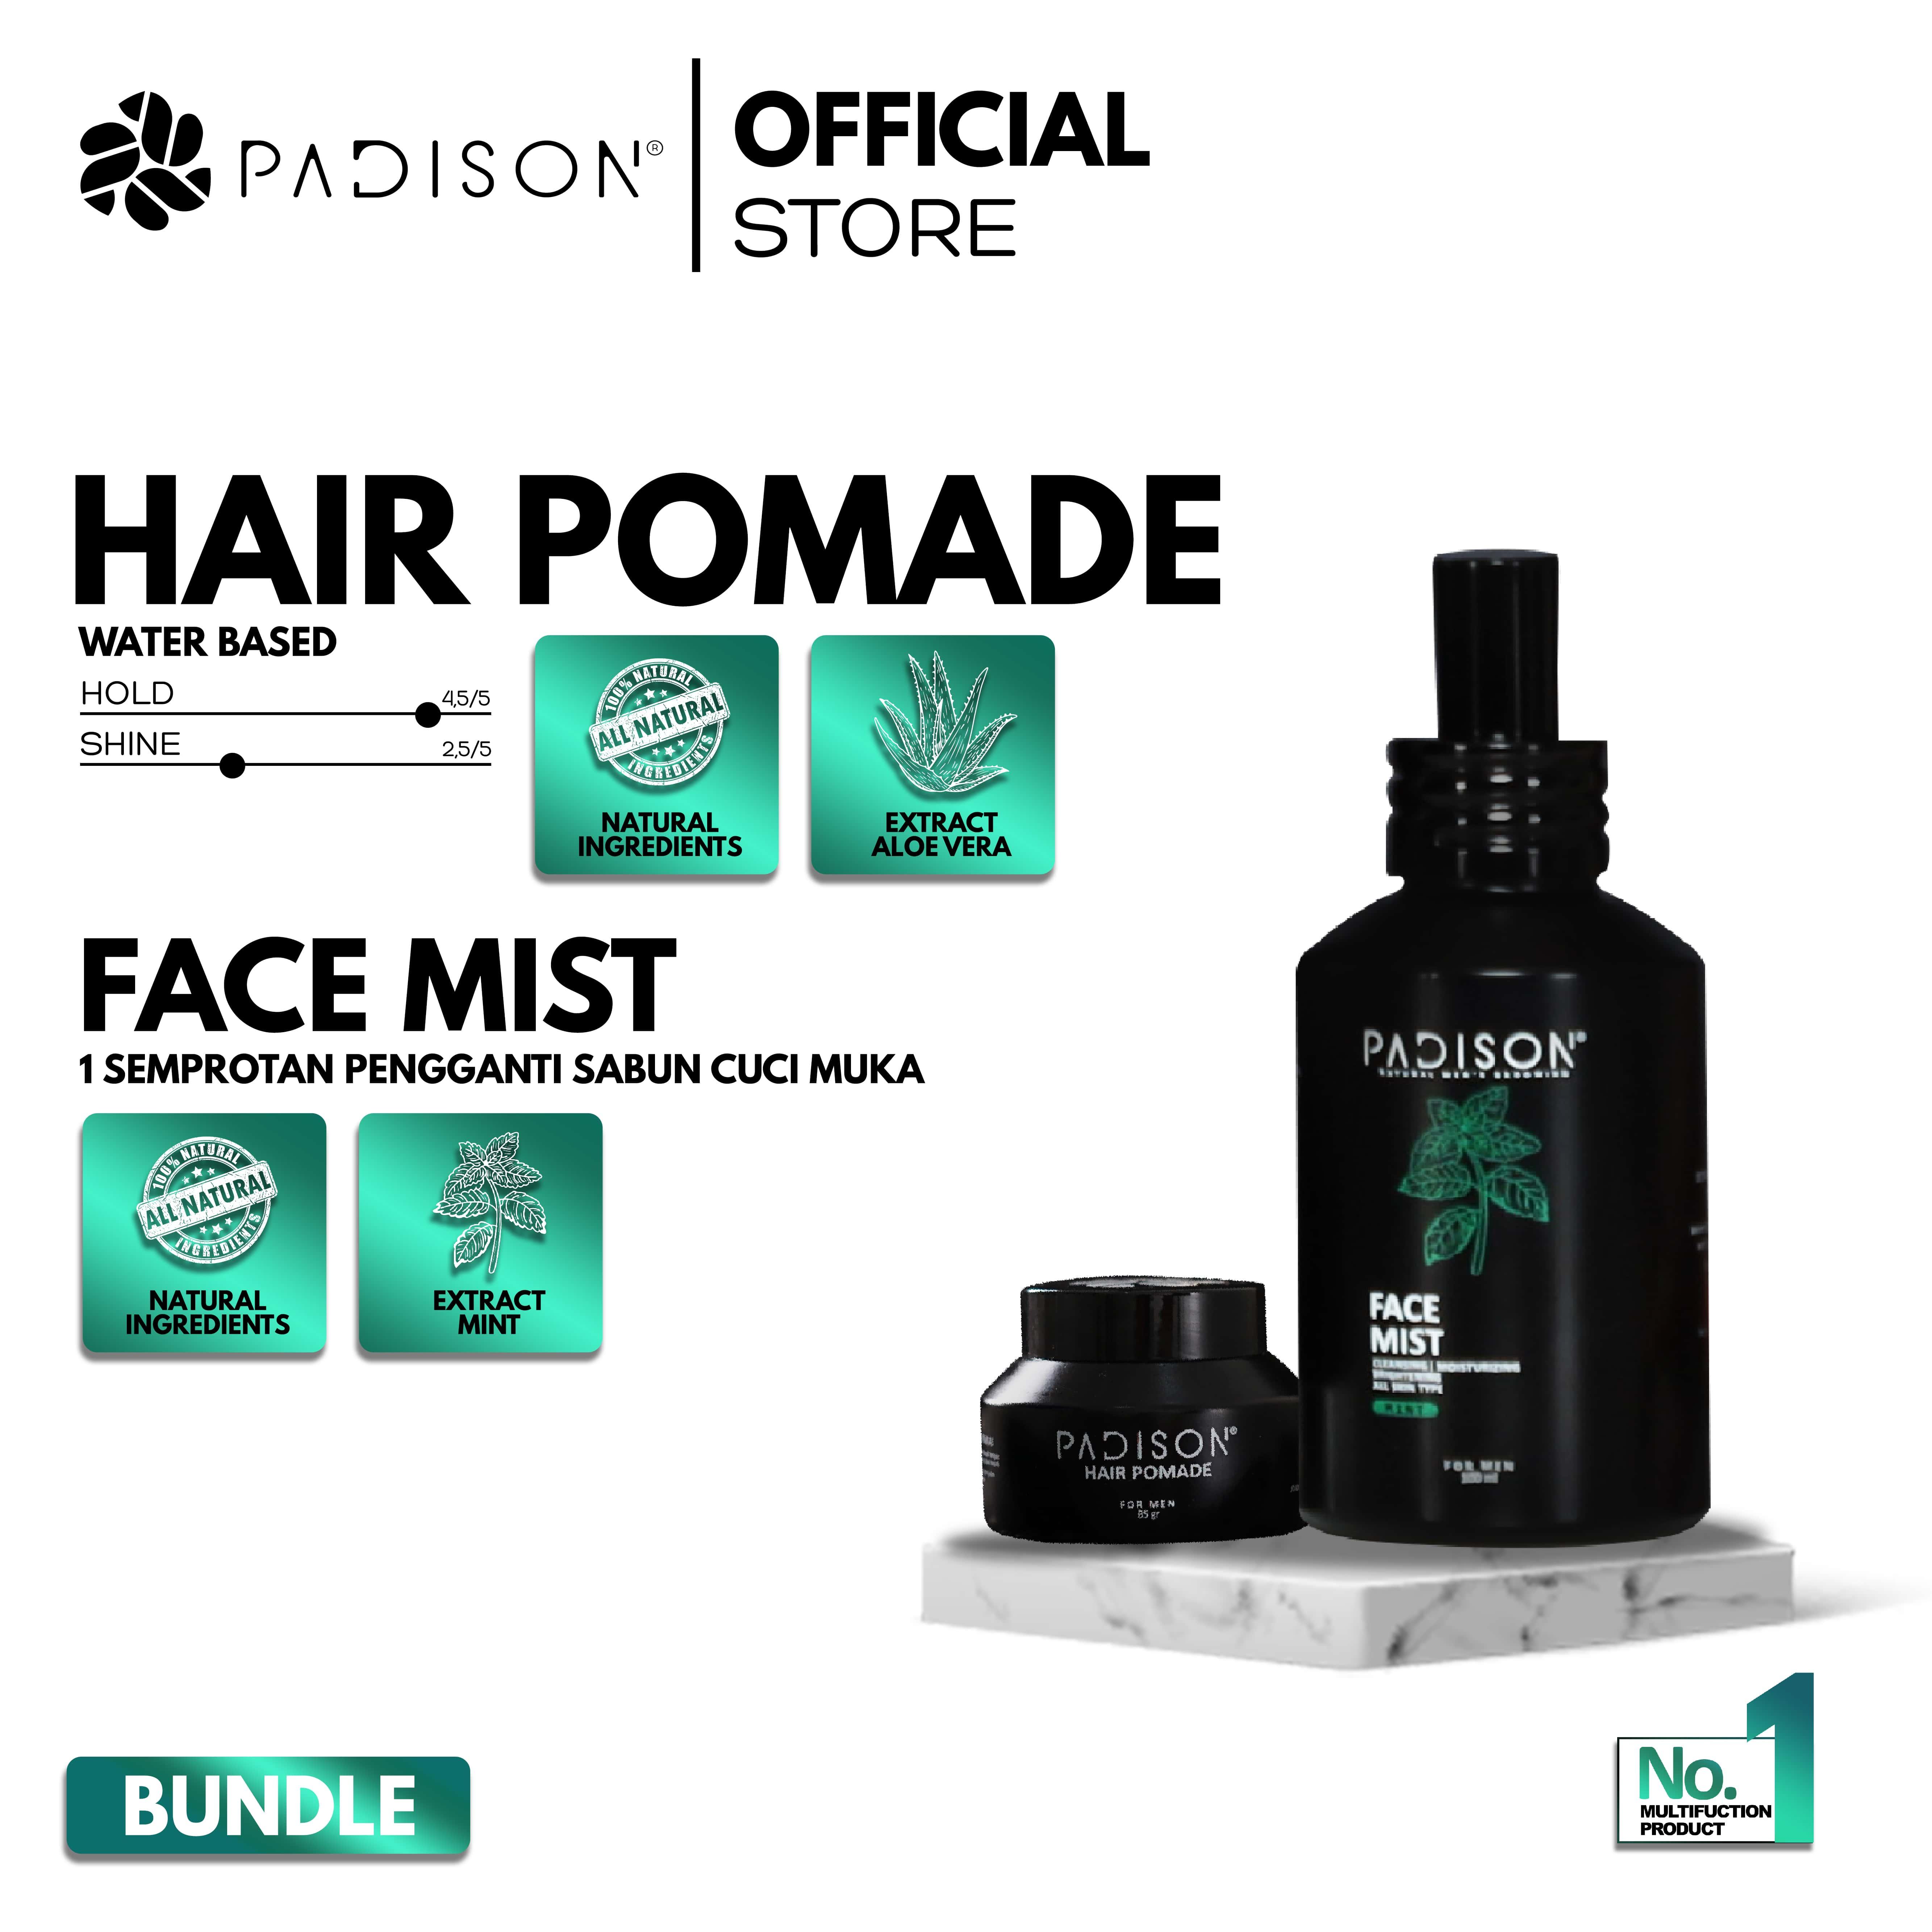 Face Mist Pembersih muka + Pomade Waterbased Minyak rambut pria thumbnail